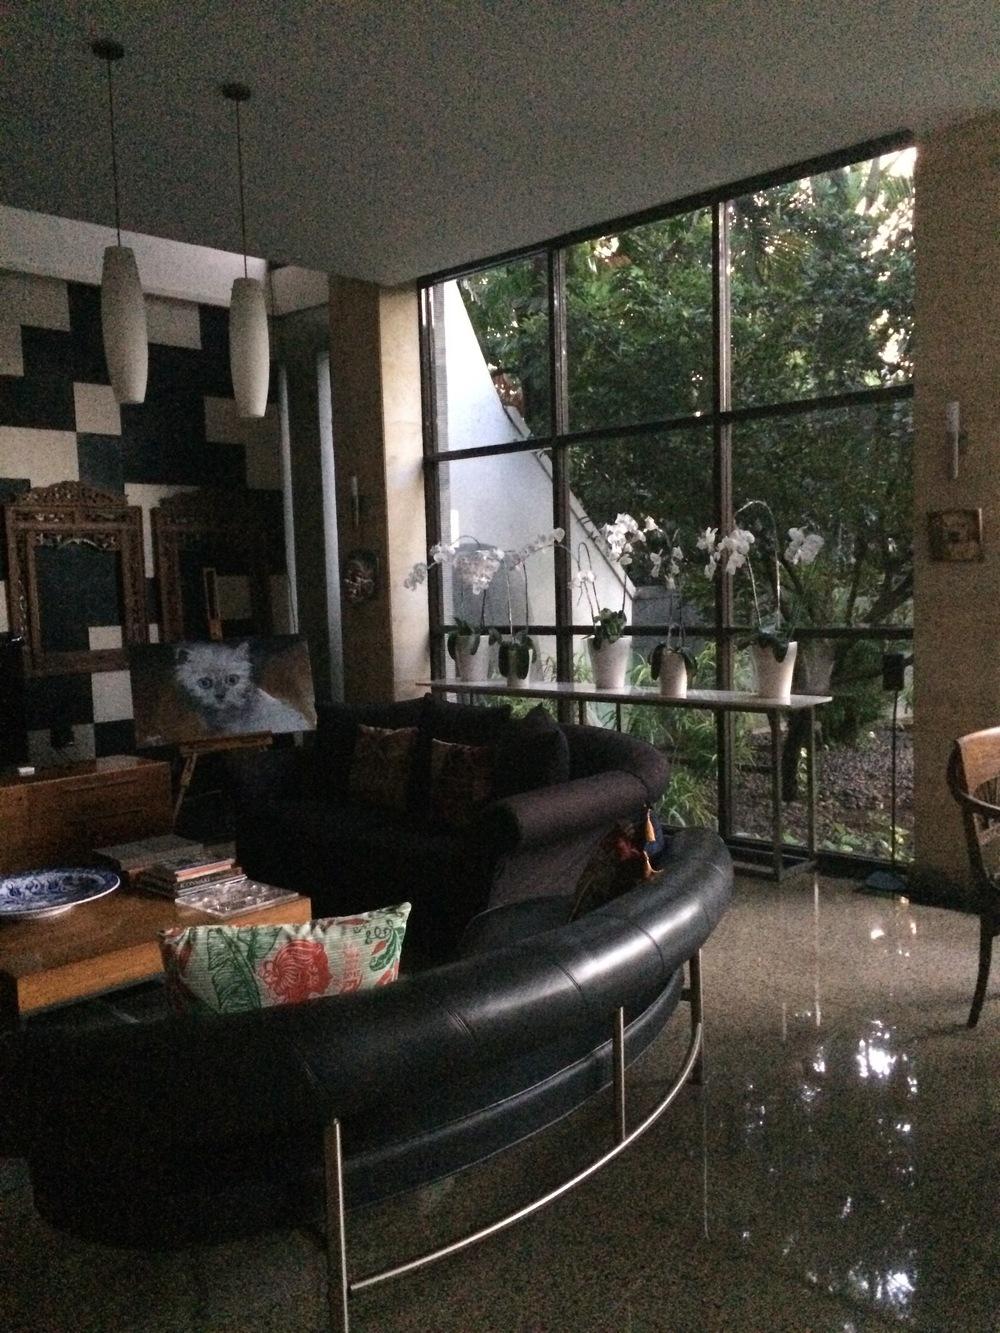 Our lovely homestay in Jakarta